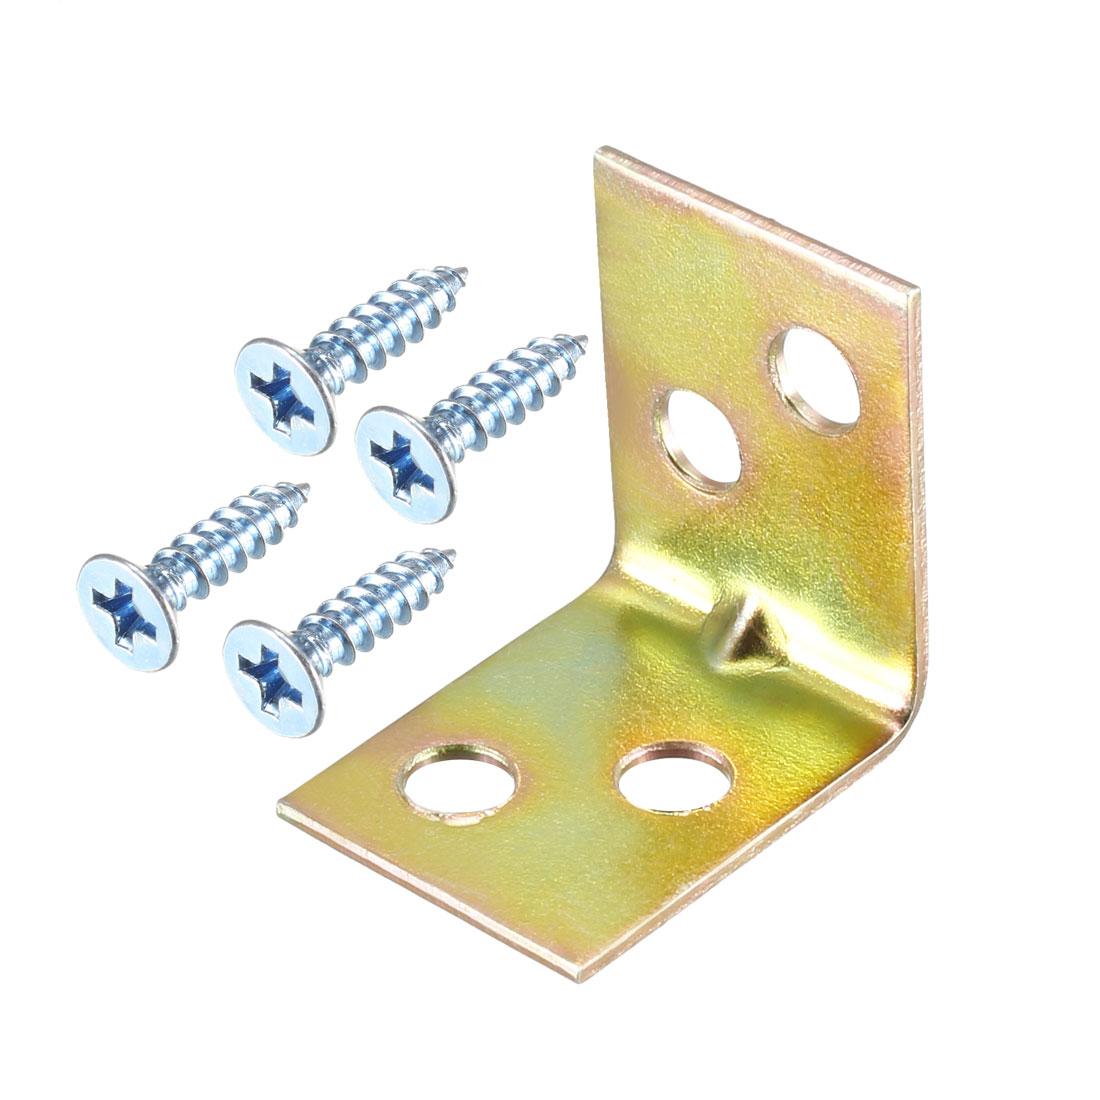 Corner Brace, 22mm x 22mm Zinc Plated Joint Right Angle Bracket w Screws, 50 Pcs